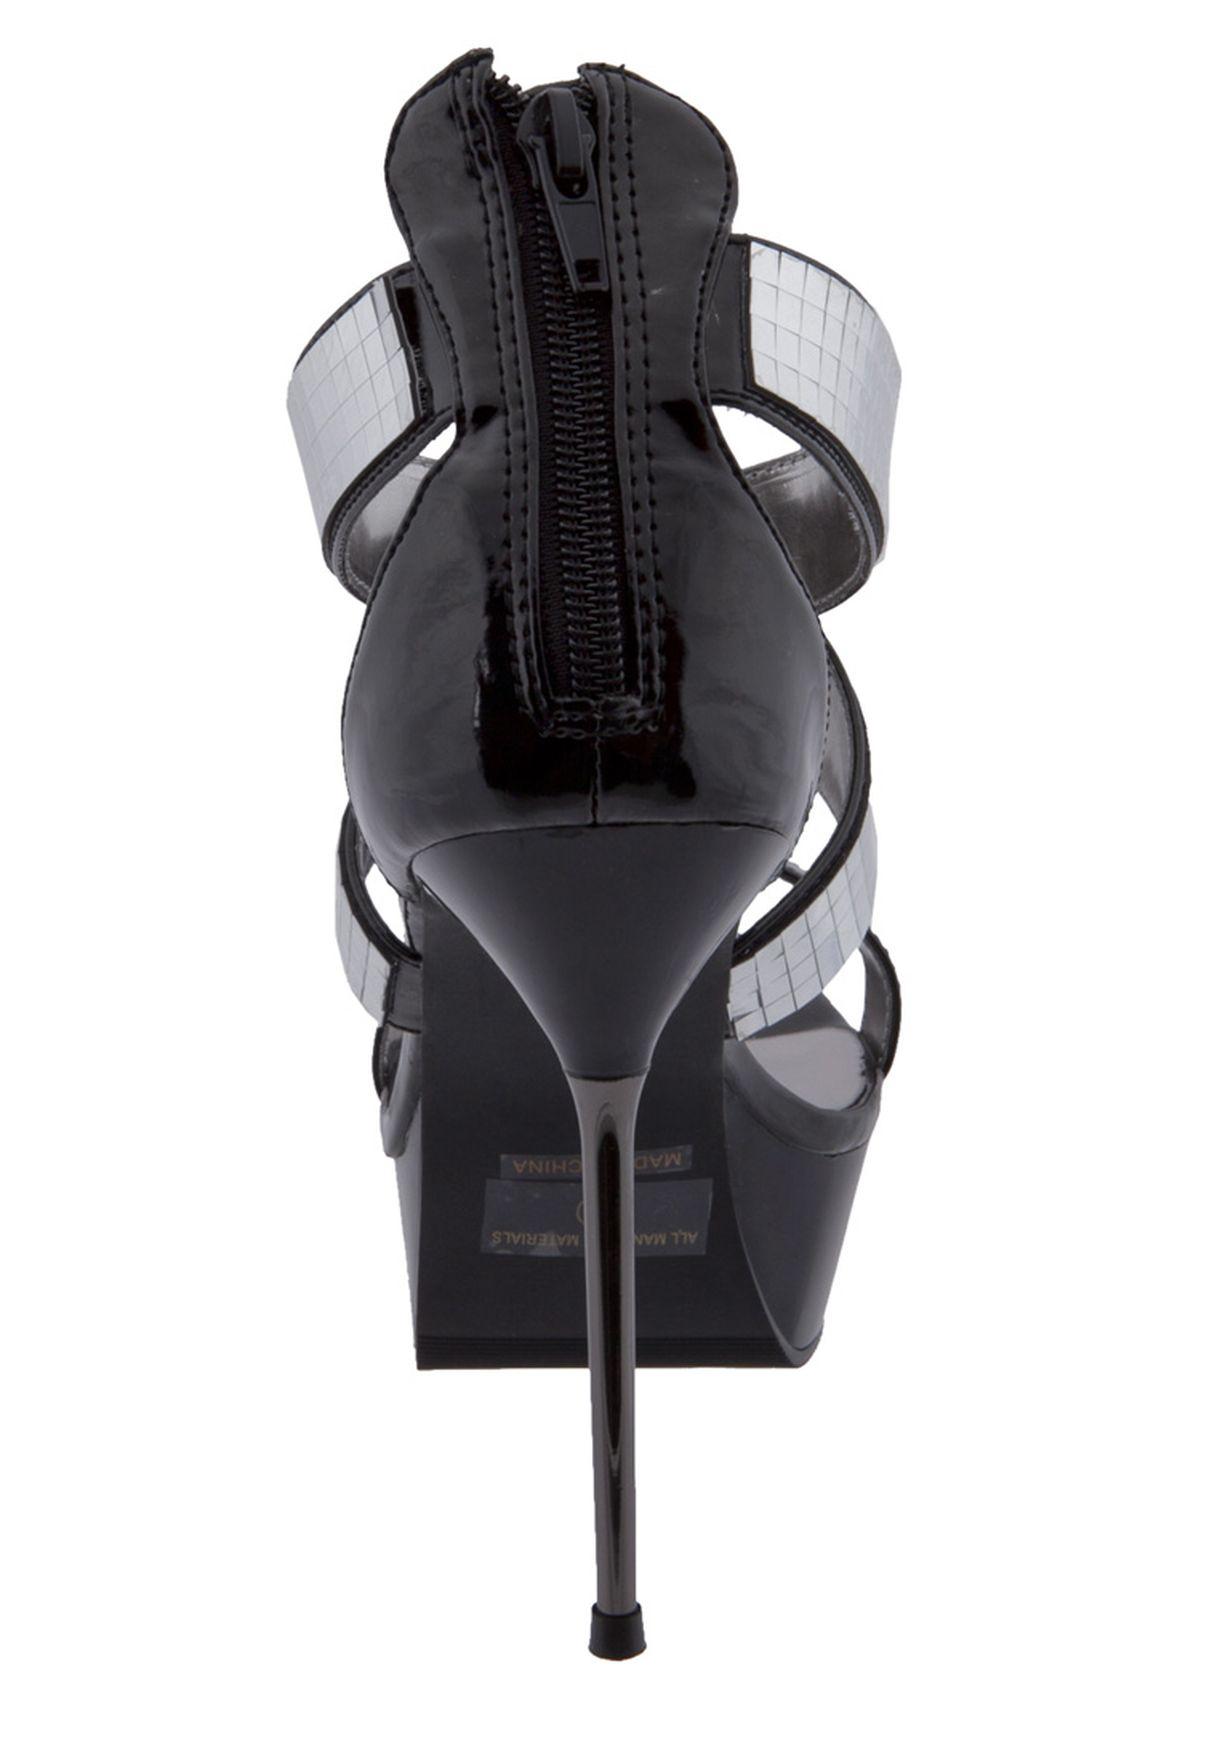 54be7e719 تسوق Embelished Sandals ماركة الي شوز لون أسود في الكويت - EL769SH57YIK